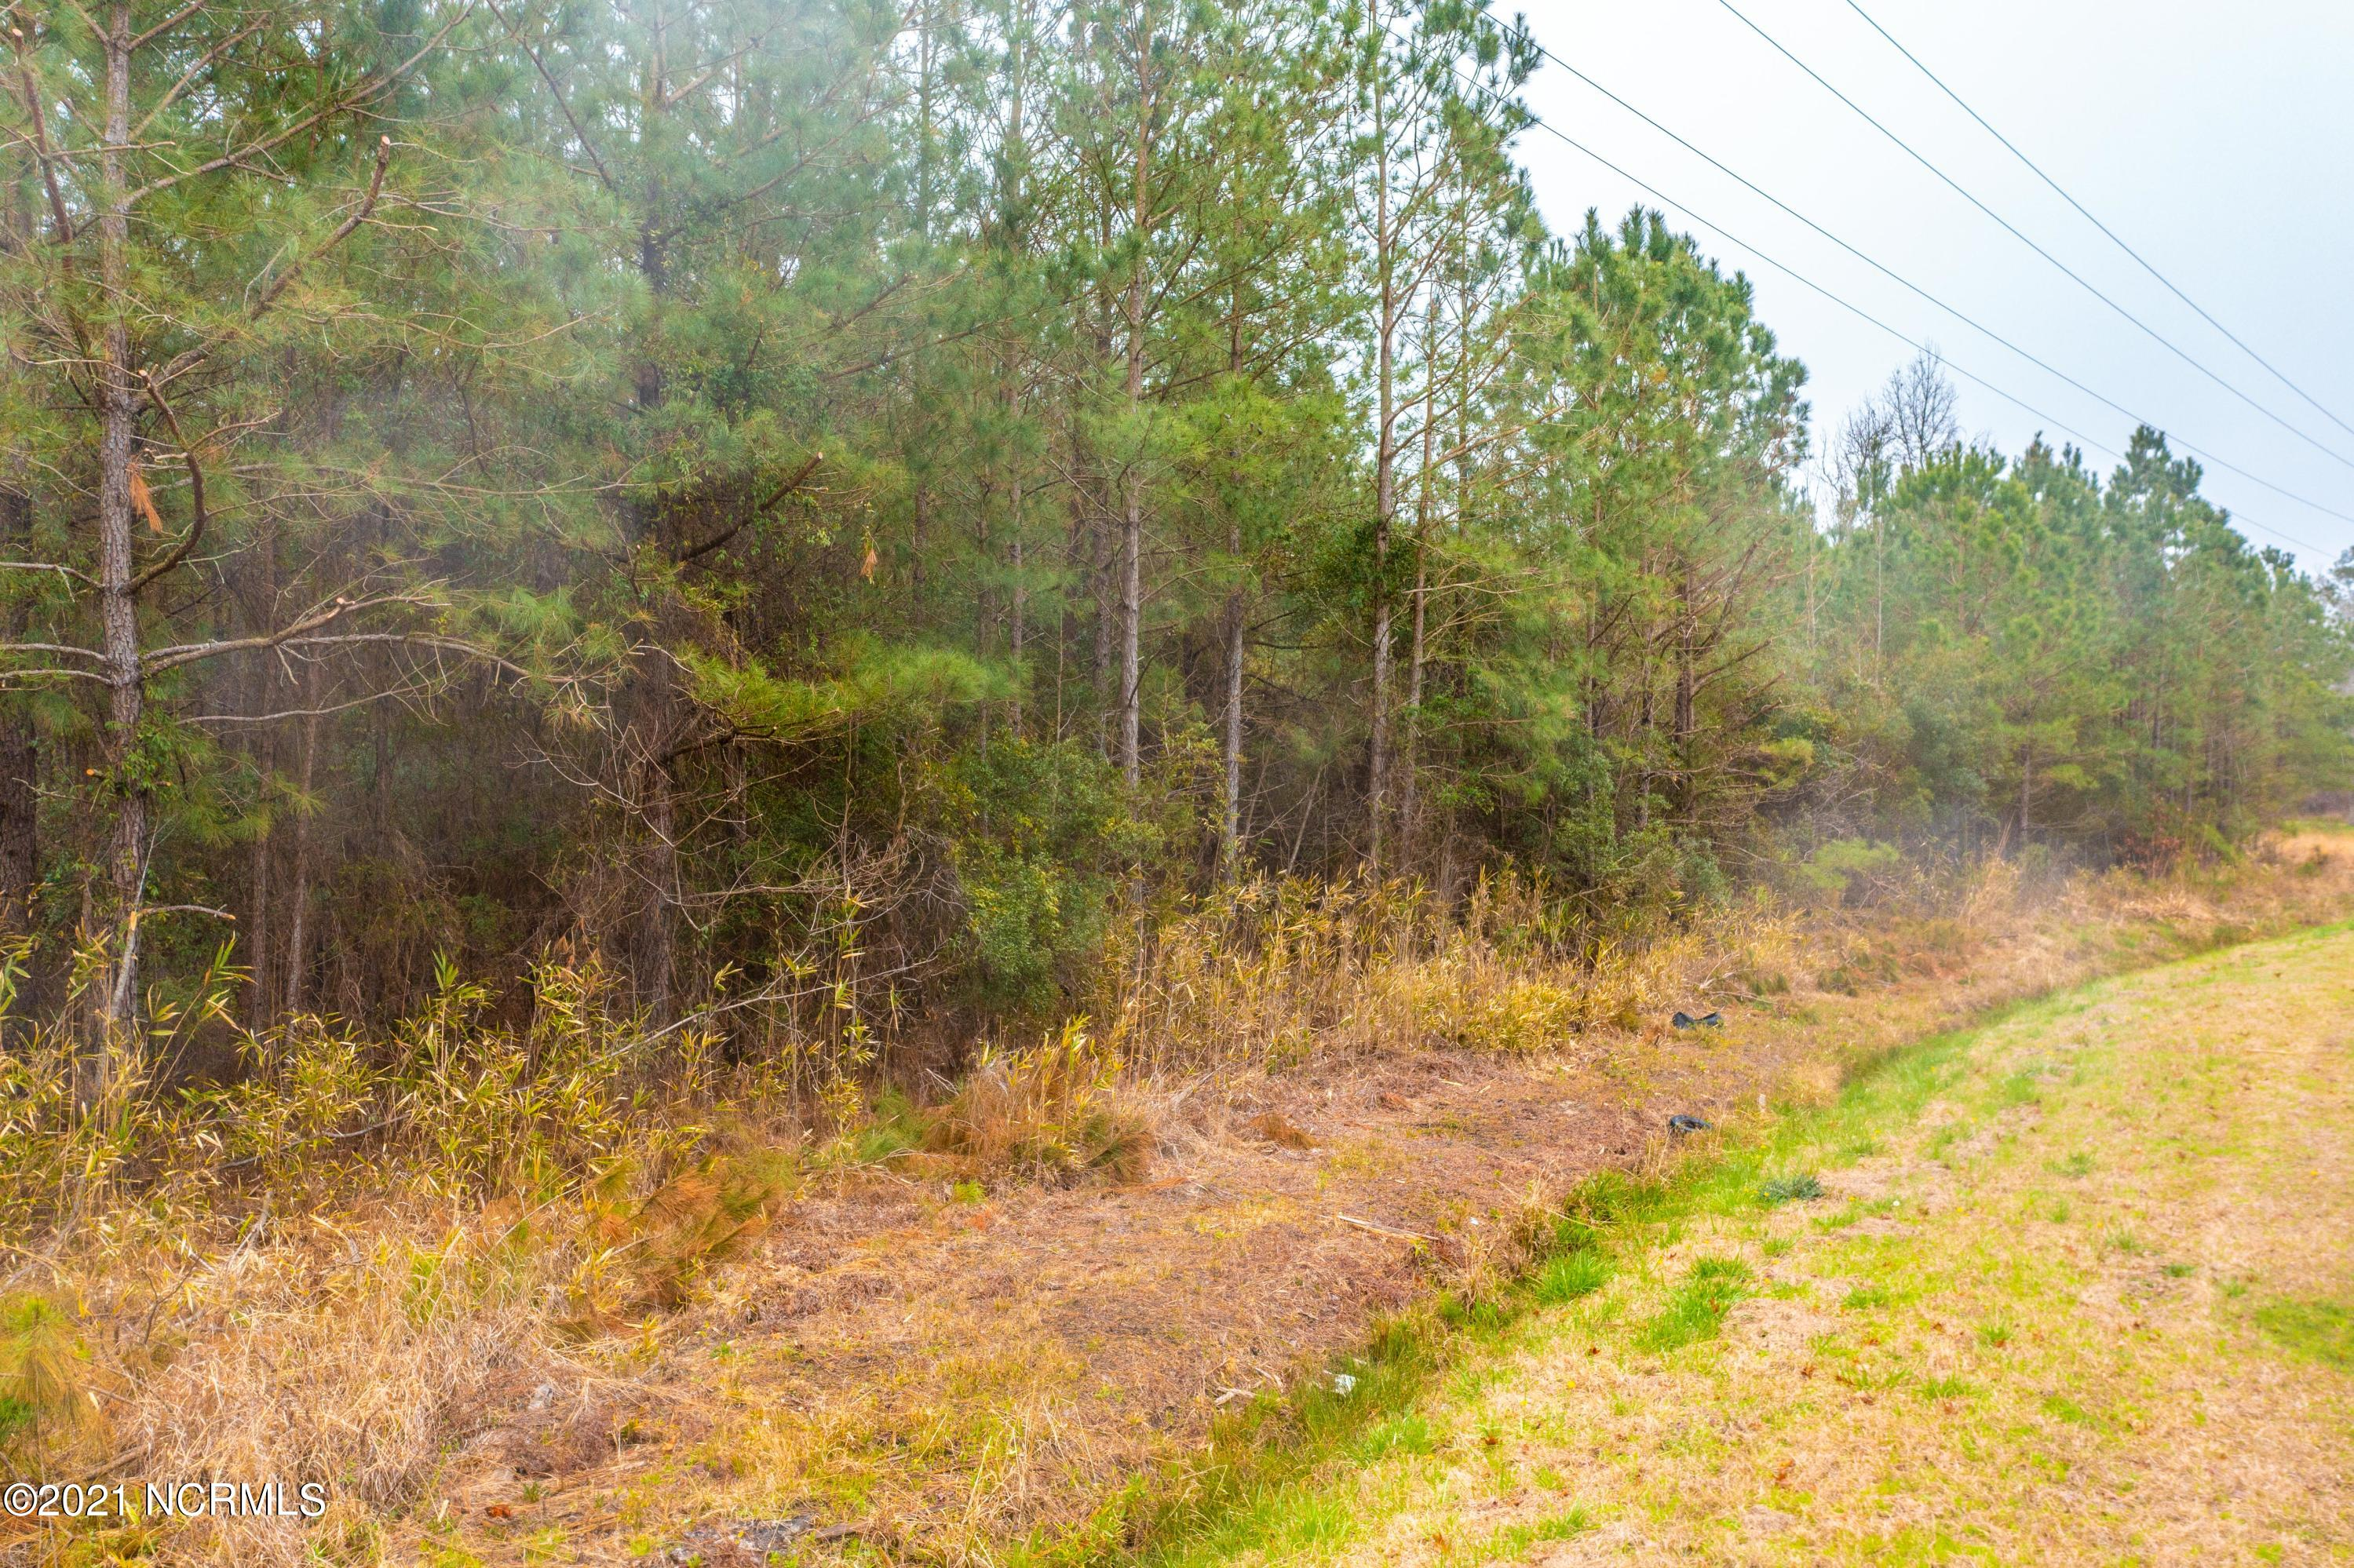 000 Pine Crest Road, Bath, North Carolina 27808, ,Residential land,For sale,Pine Crest,100263253